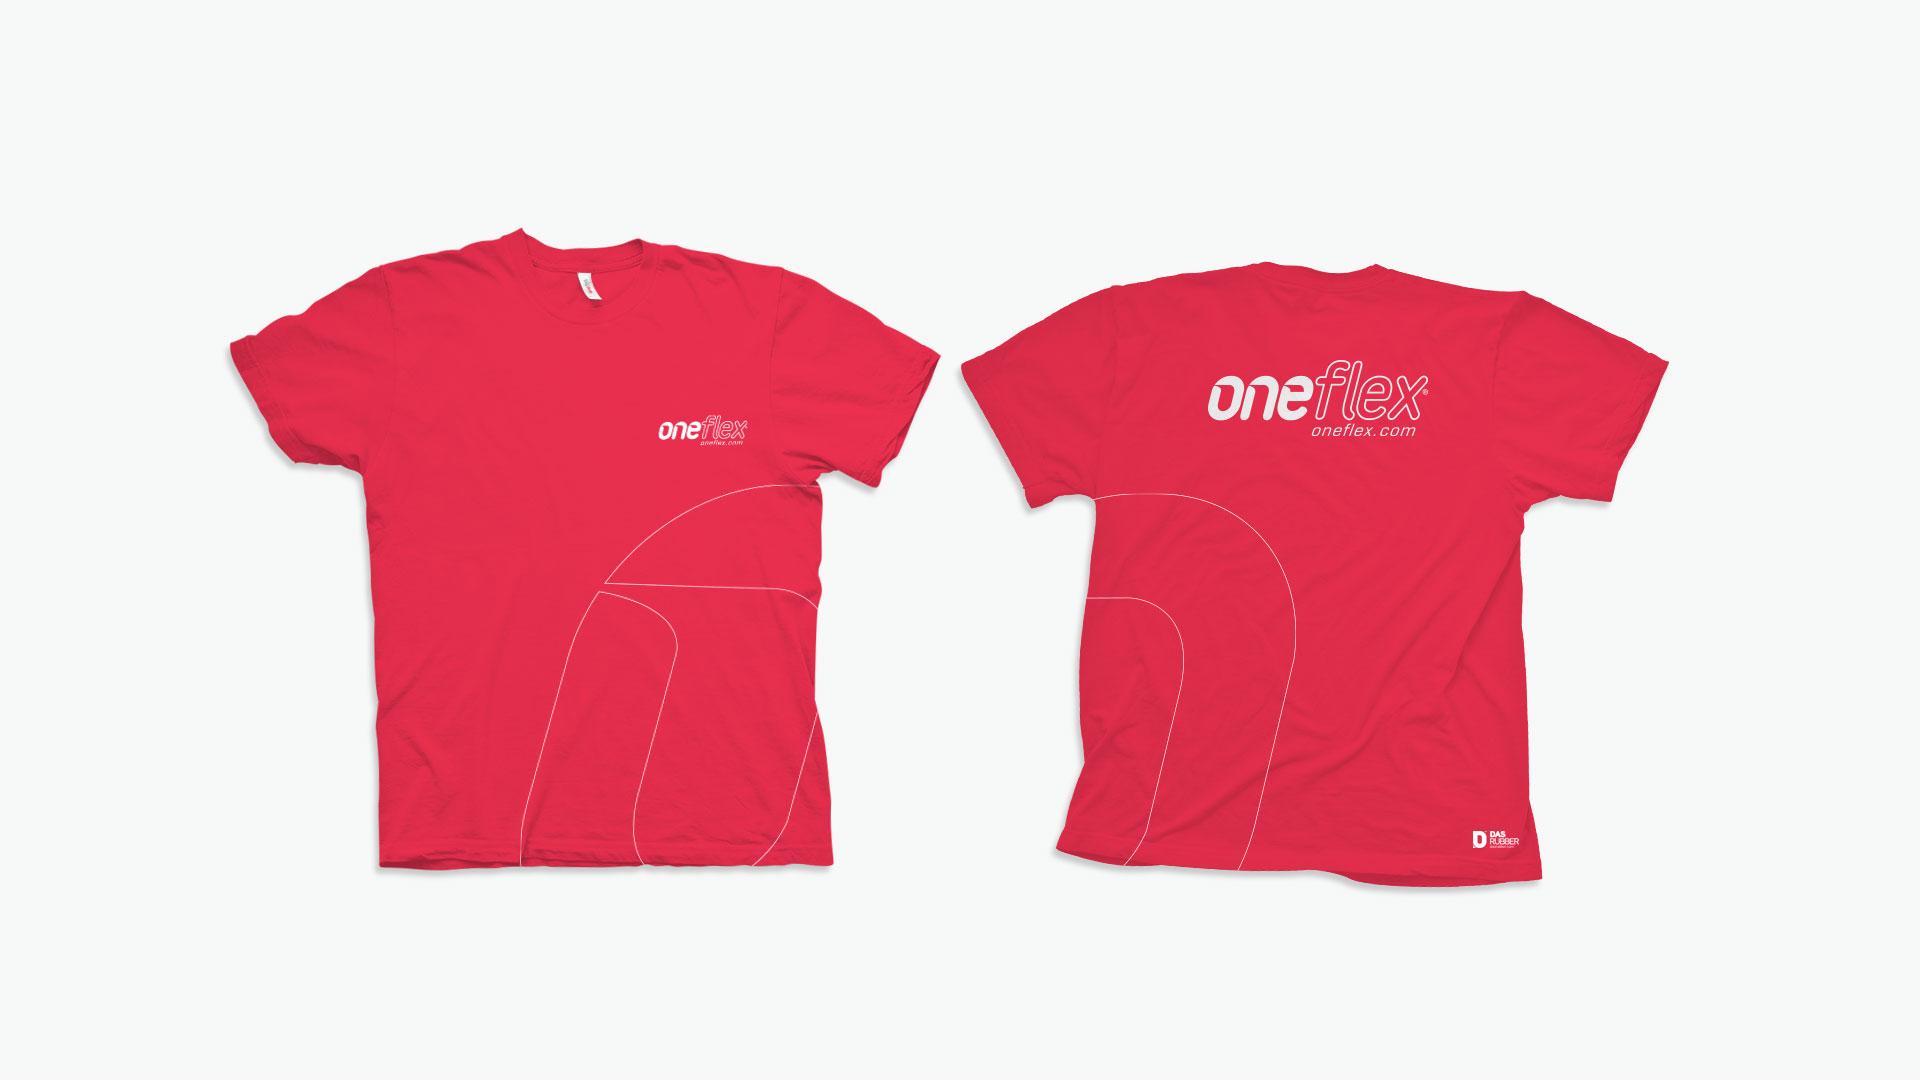 oneflex_07